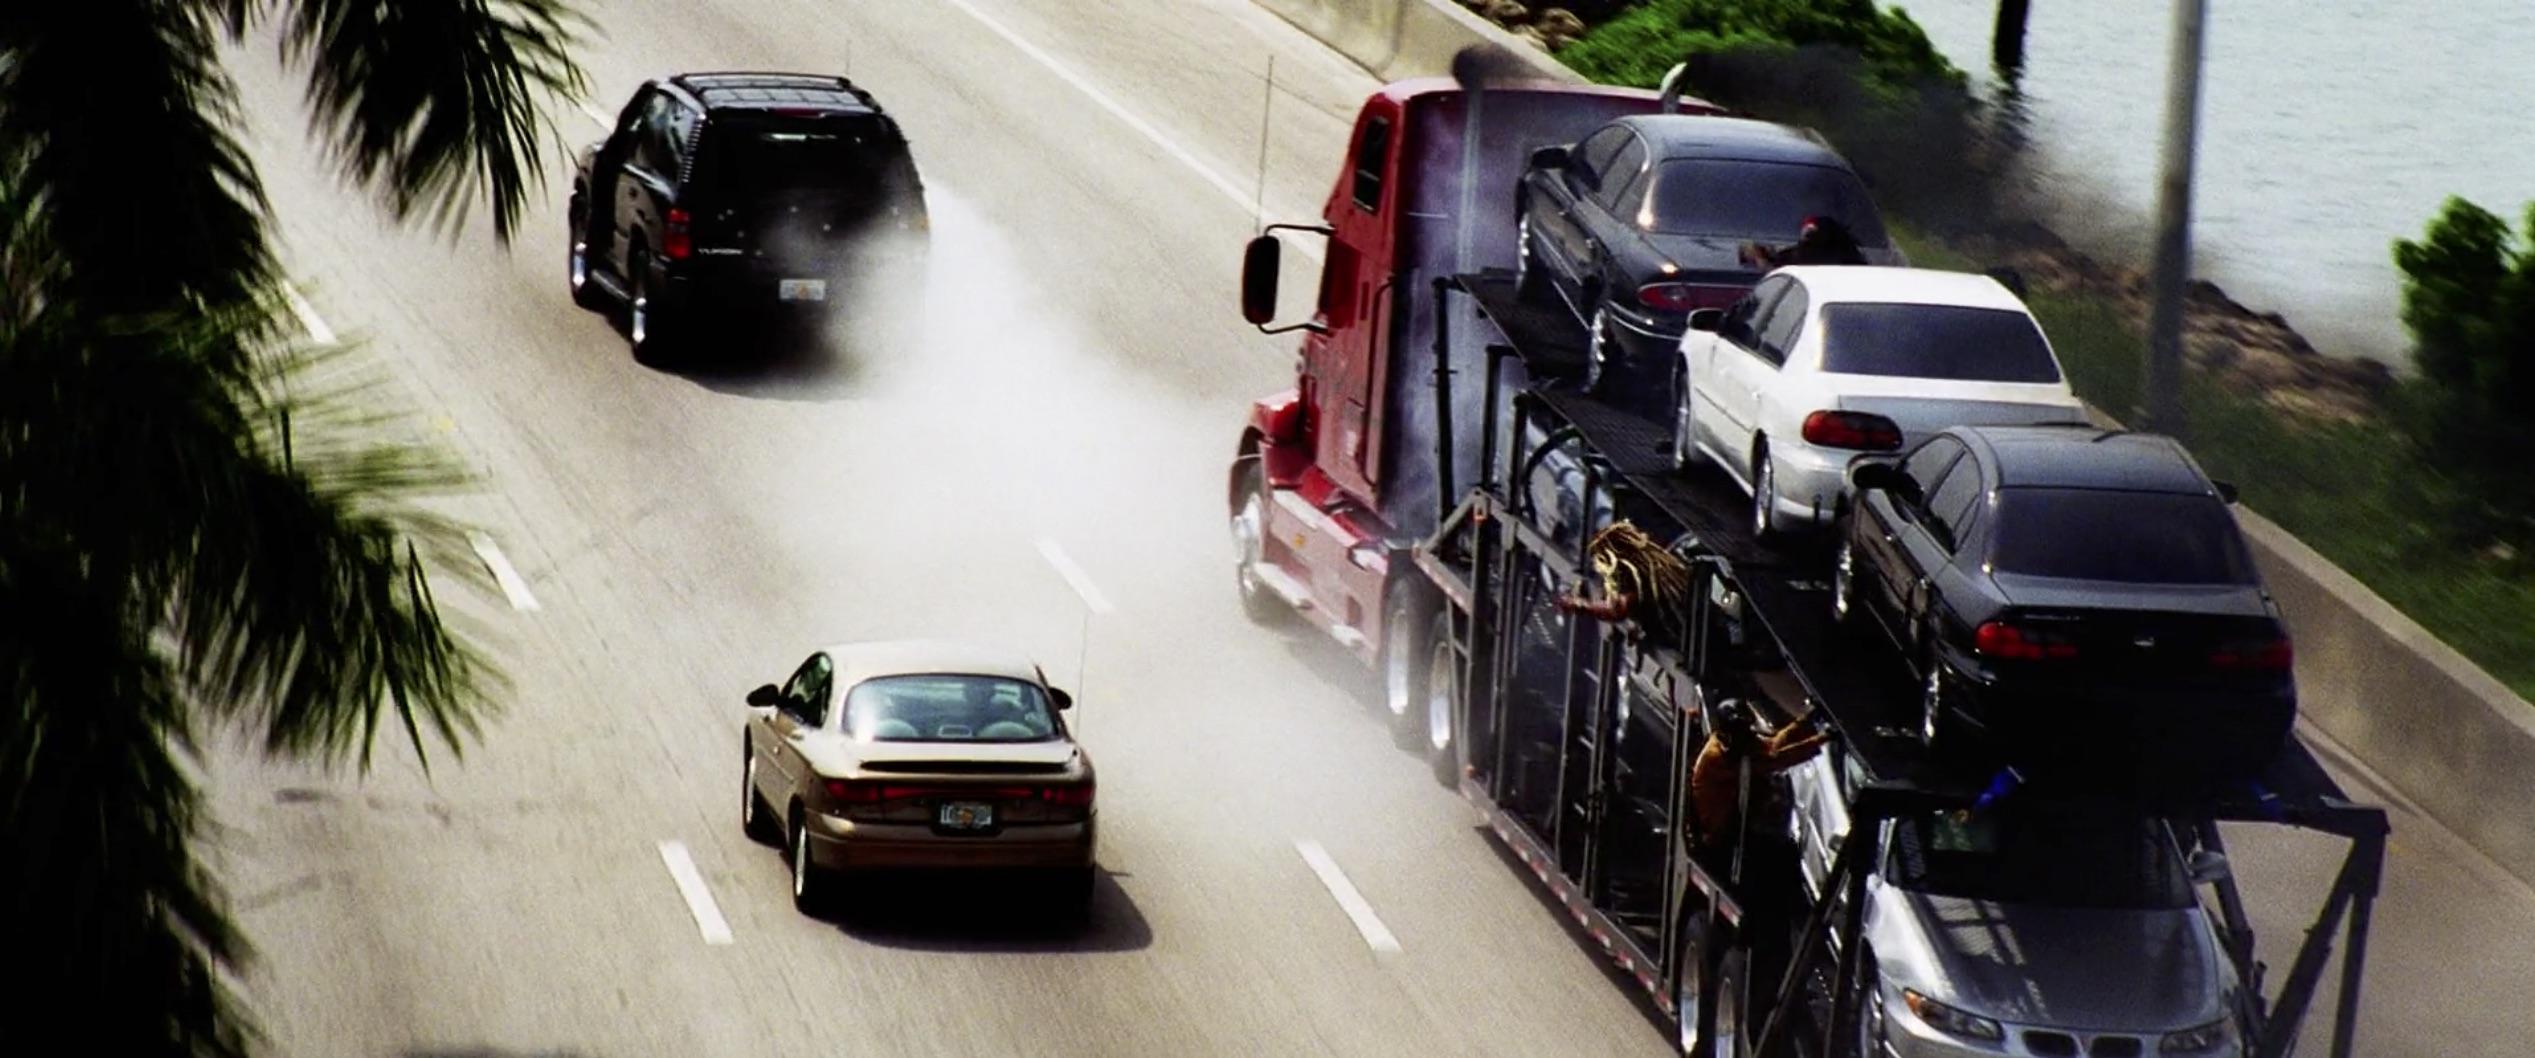 Bad Boys II semi truck chase